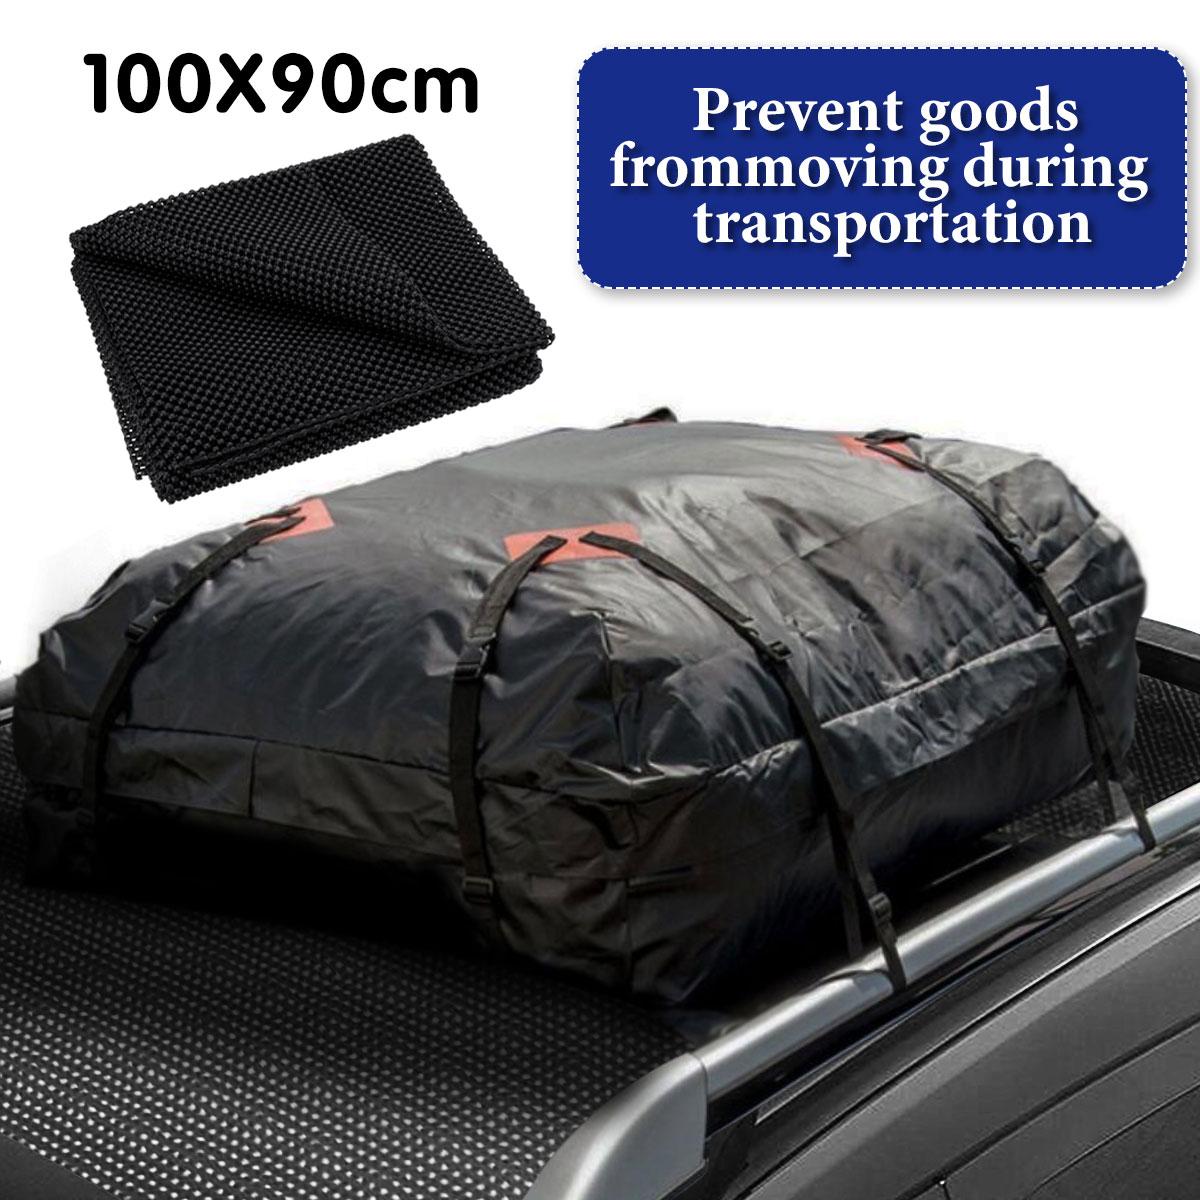 100x90CM techo superior del coche maletero trasero SUV equipaje de carga bolsa de equipaje antideslizante estera cojín acolchado tapetes plegables cubierta